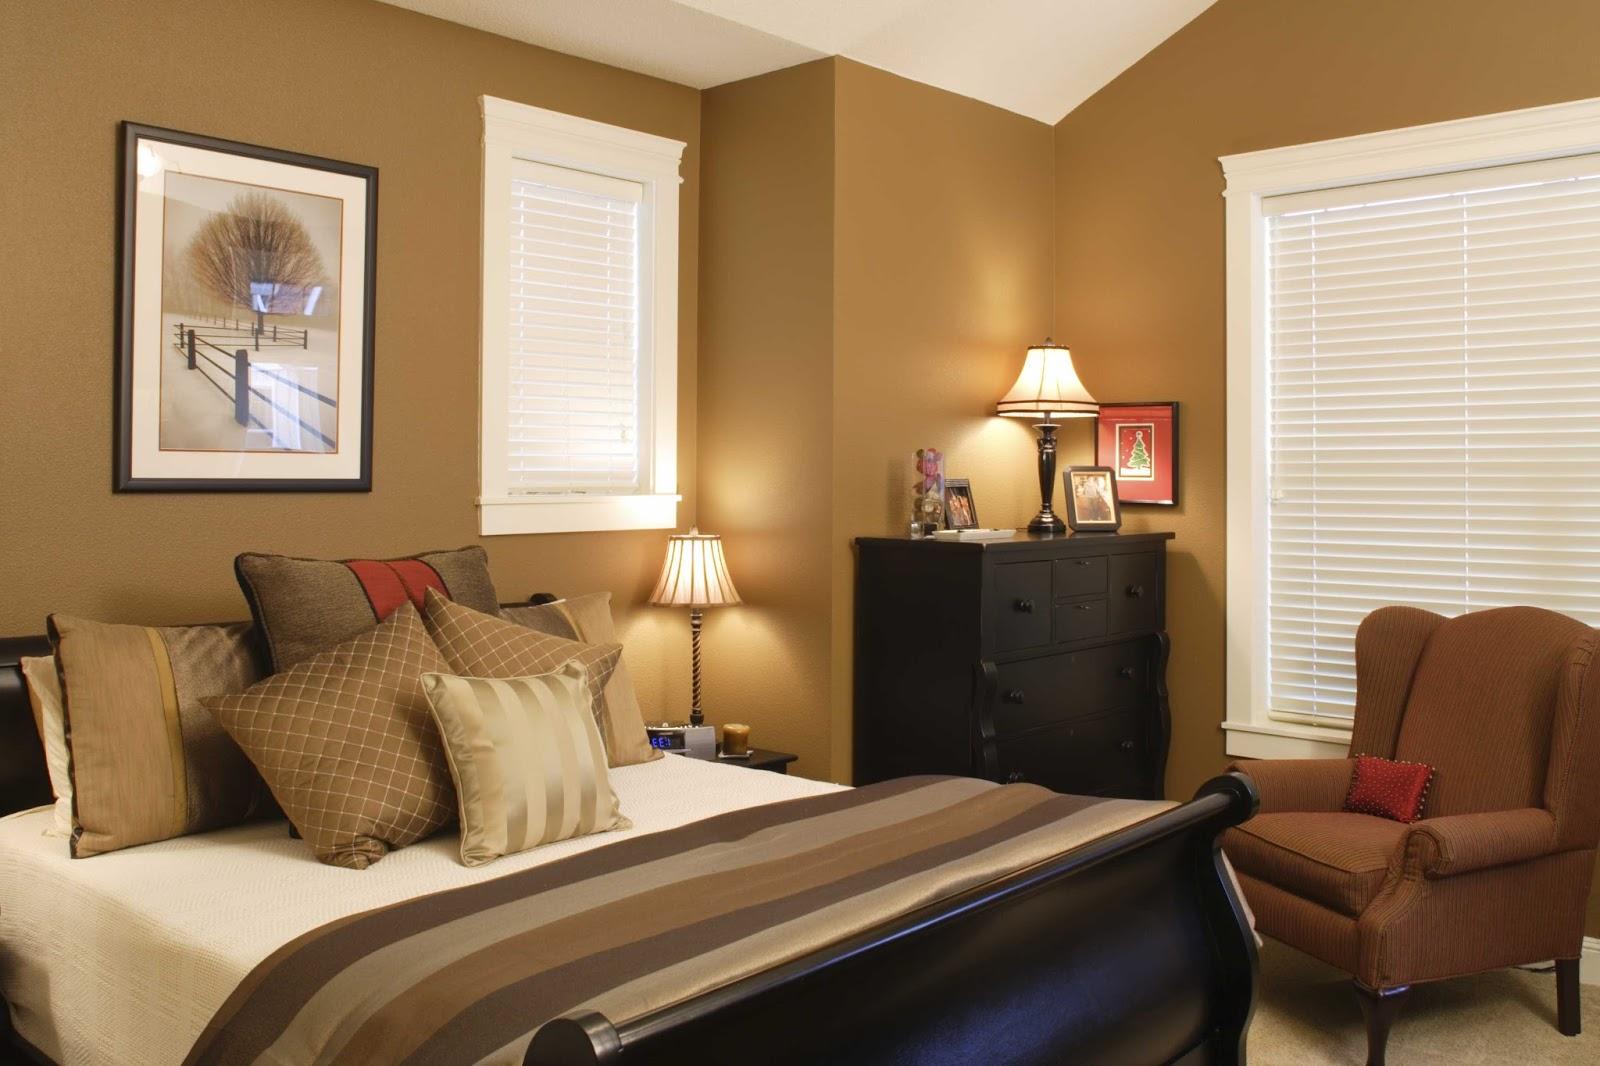 Rooms Colors Bedrooms Interior Bedroom Colors Interior Bedroom Colors Violet Color